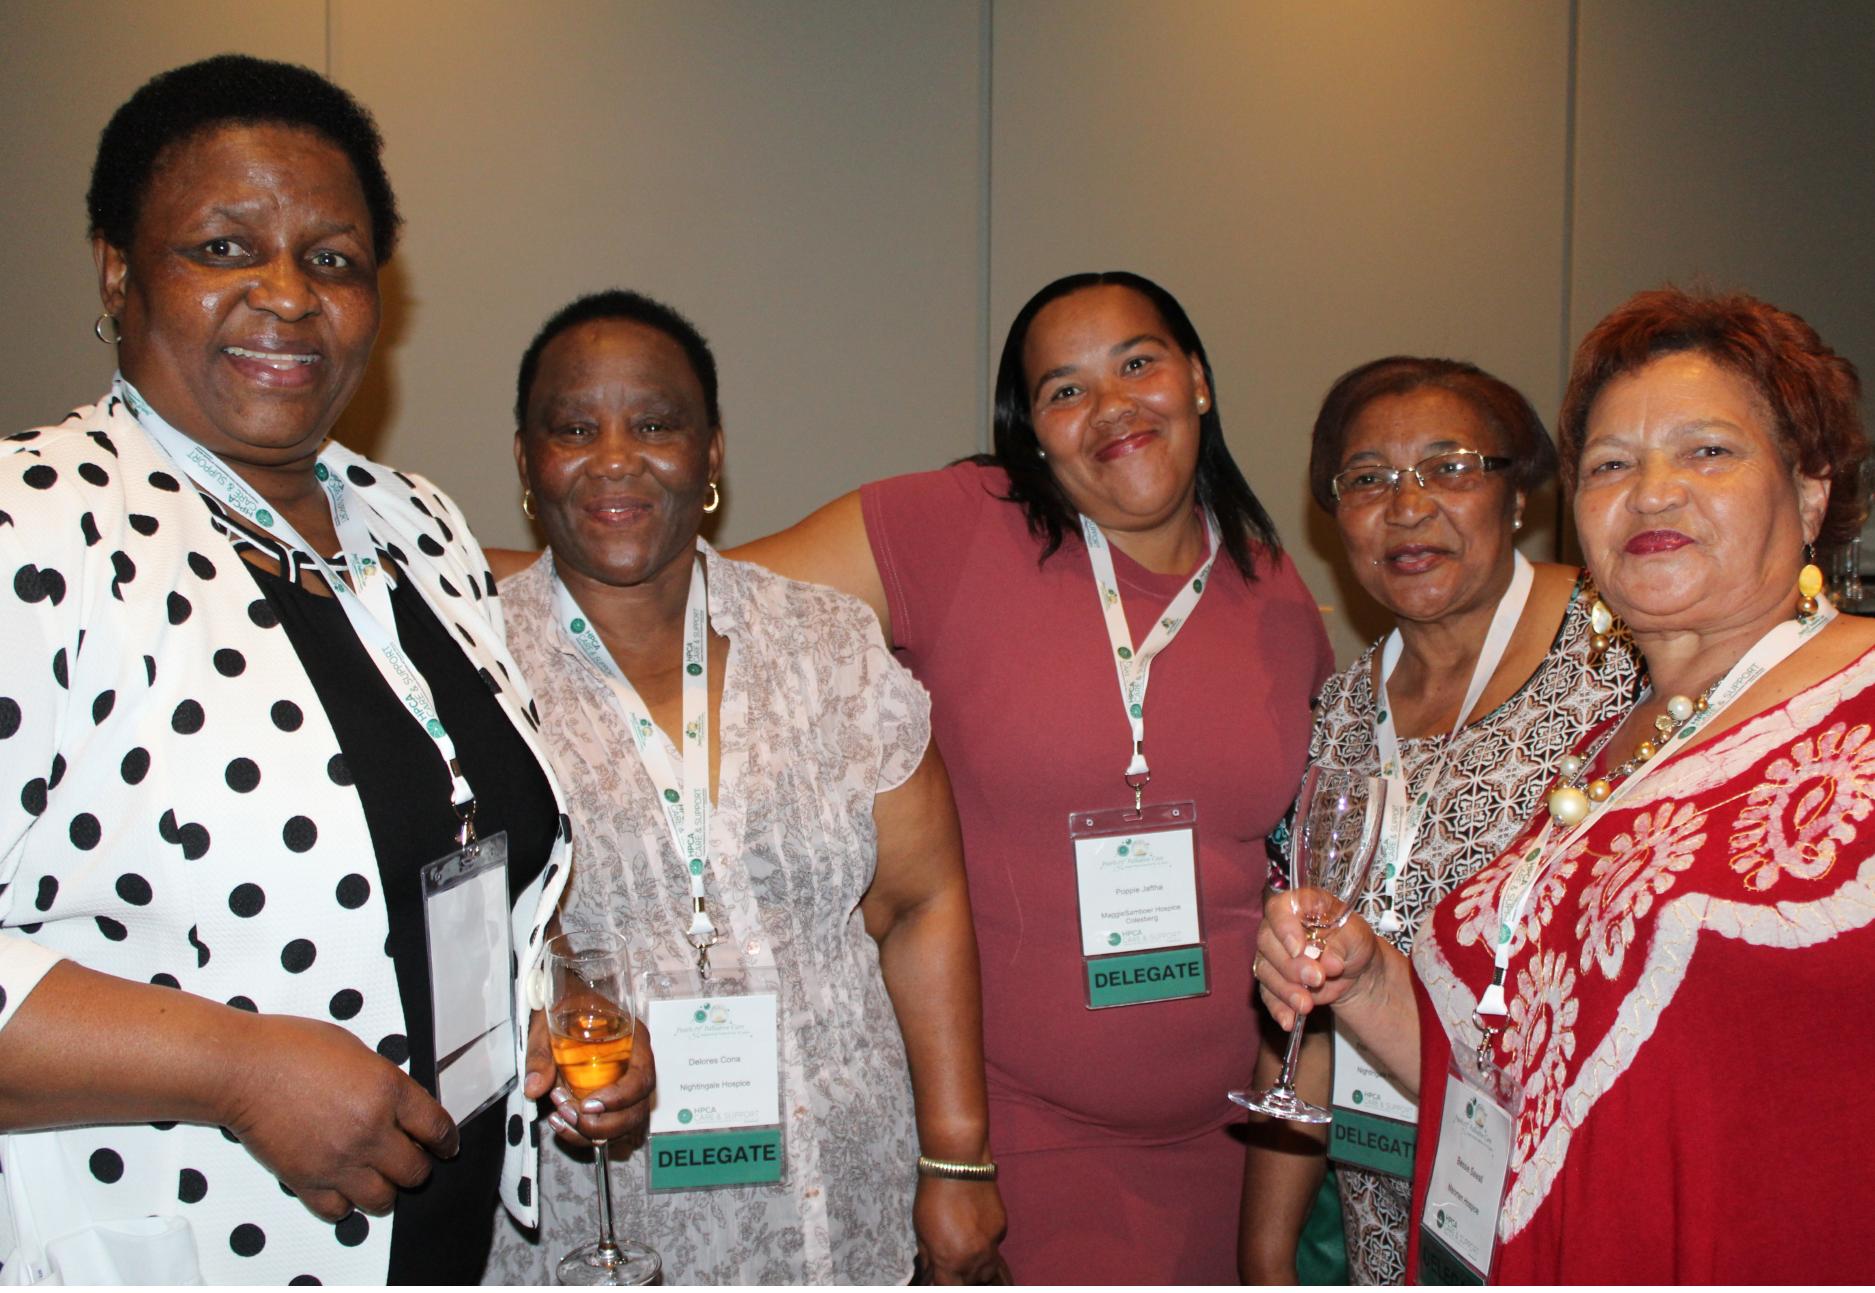 HPCA Symposium 2017: A Huge Success!